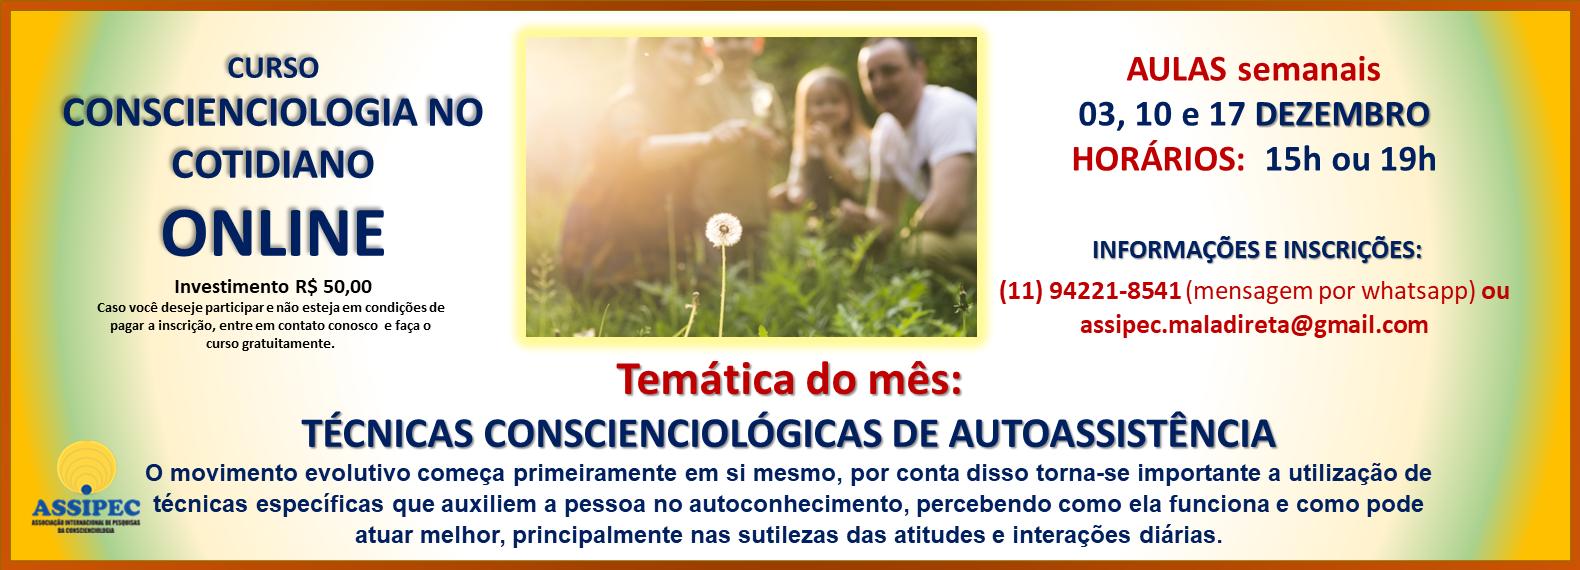 site CCIOLOGIA COTIDIANO DEZEMBRO ONLINE